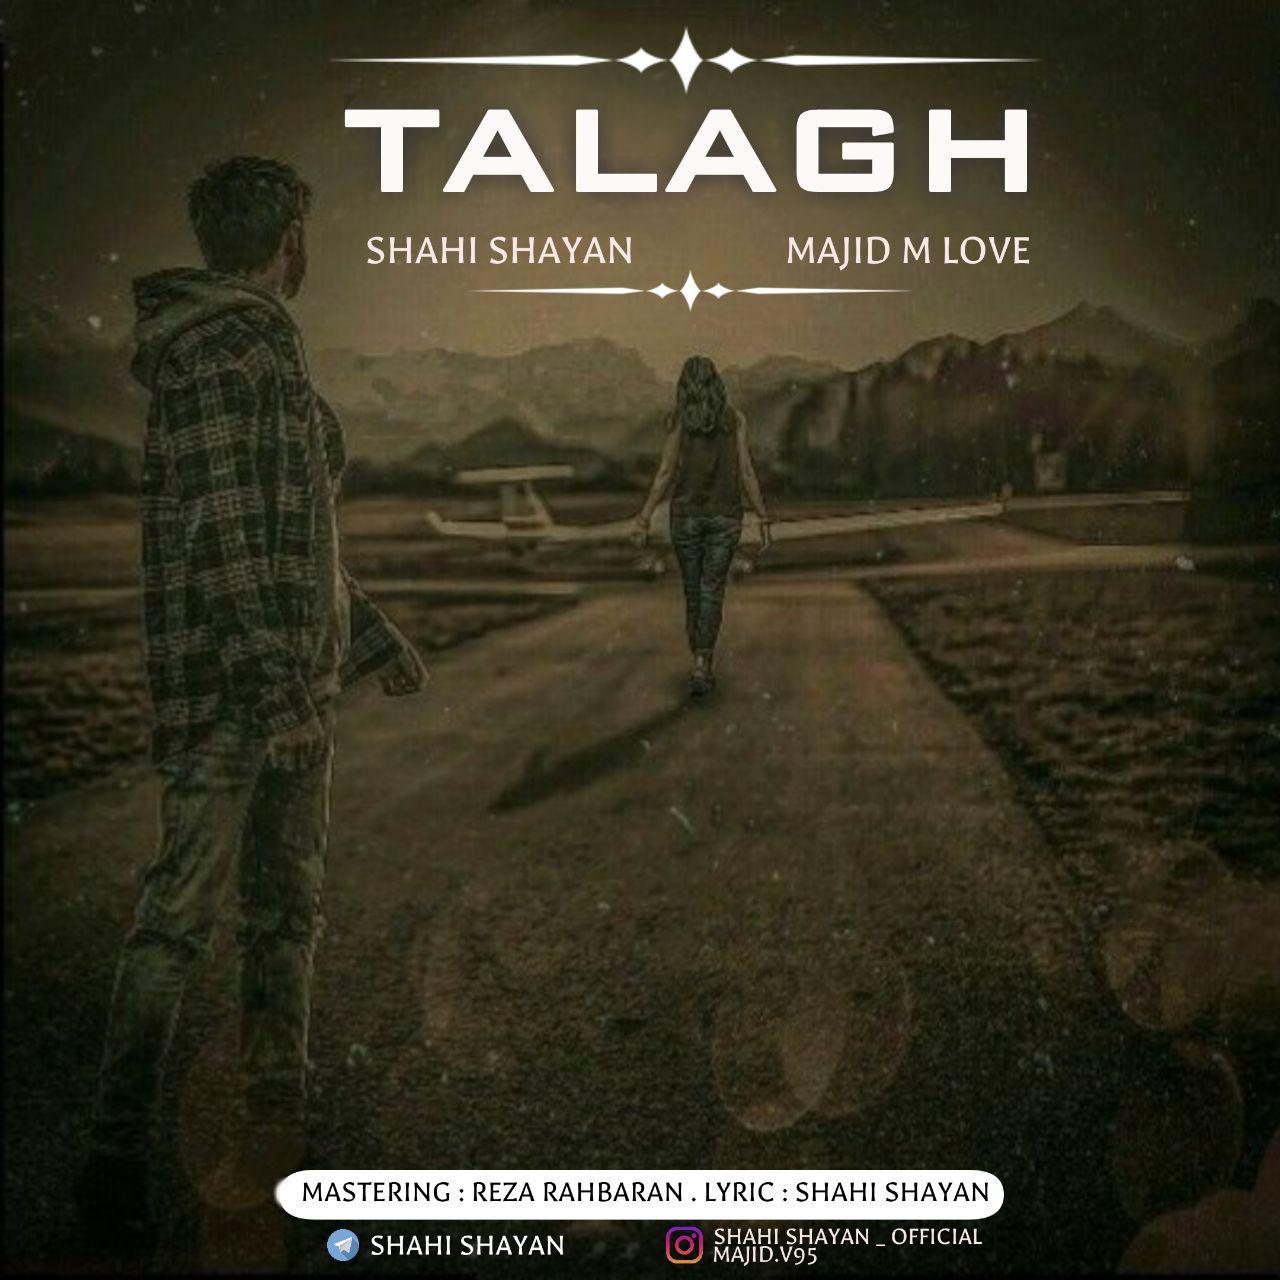 http://s3.picofile.com/file/8364152650/19Shahi_Shayan_Feat_Majid_M_Love_Talagh.jpg